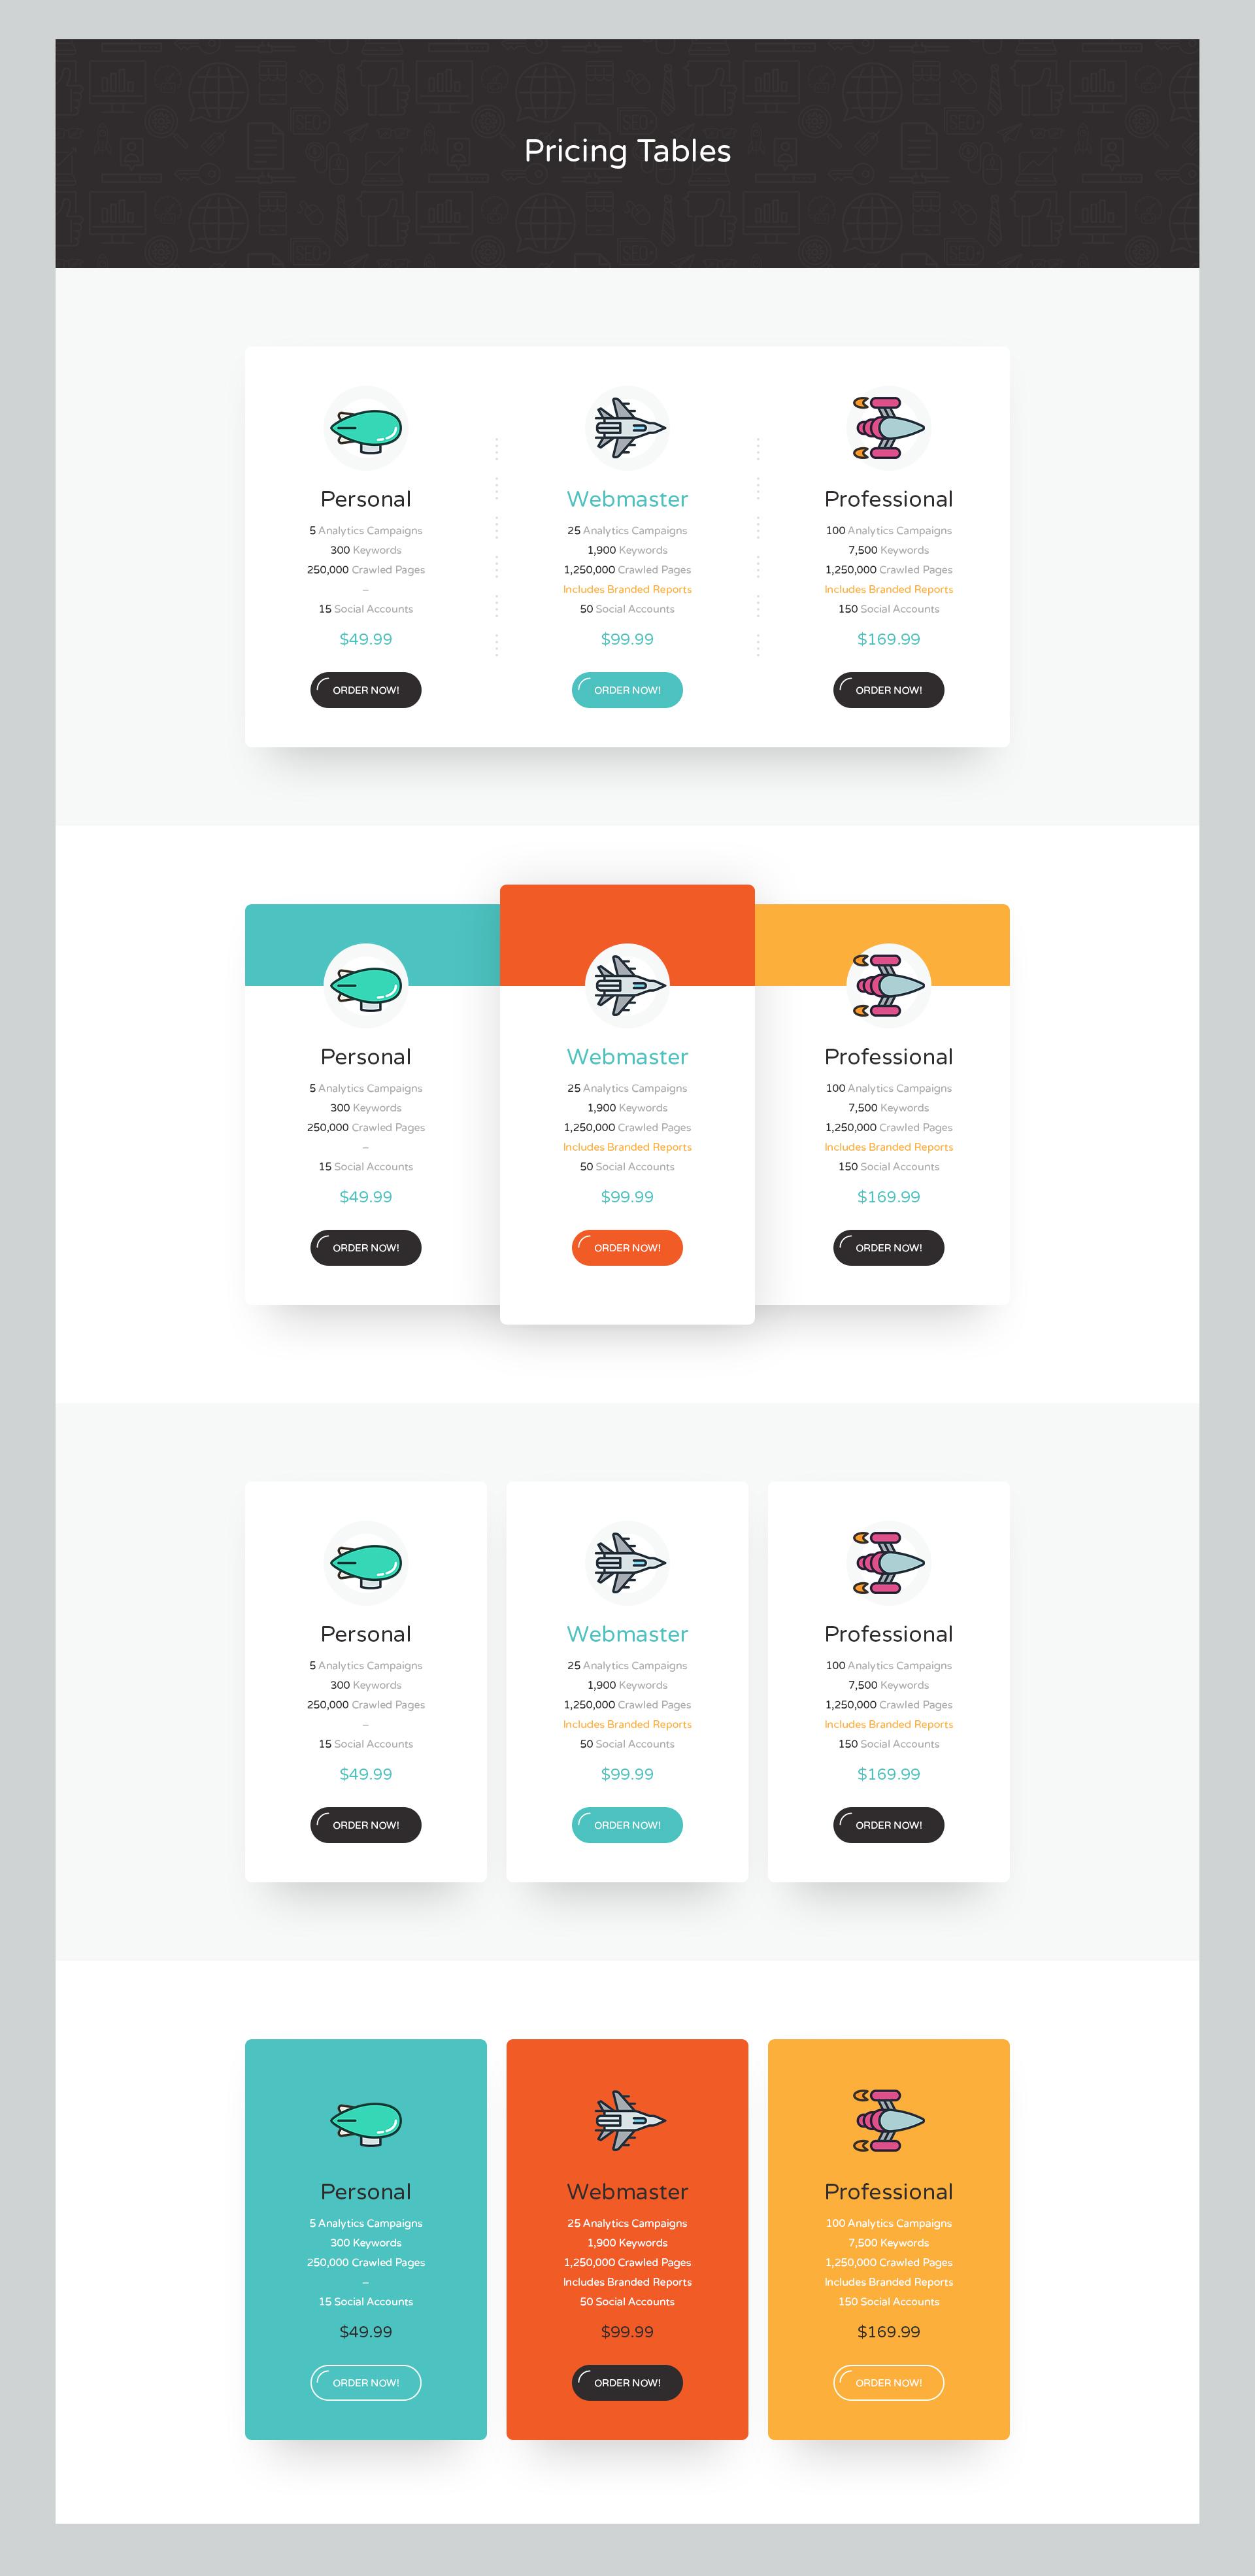 Seosight seo digital marketing agency psd template by themefire seosight seo digital marketing agency psd template toneelgroepblik Gallery